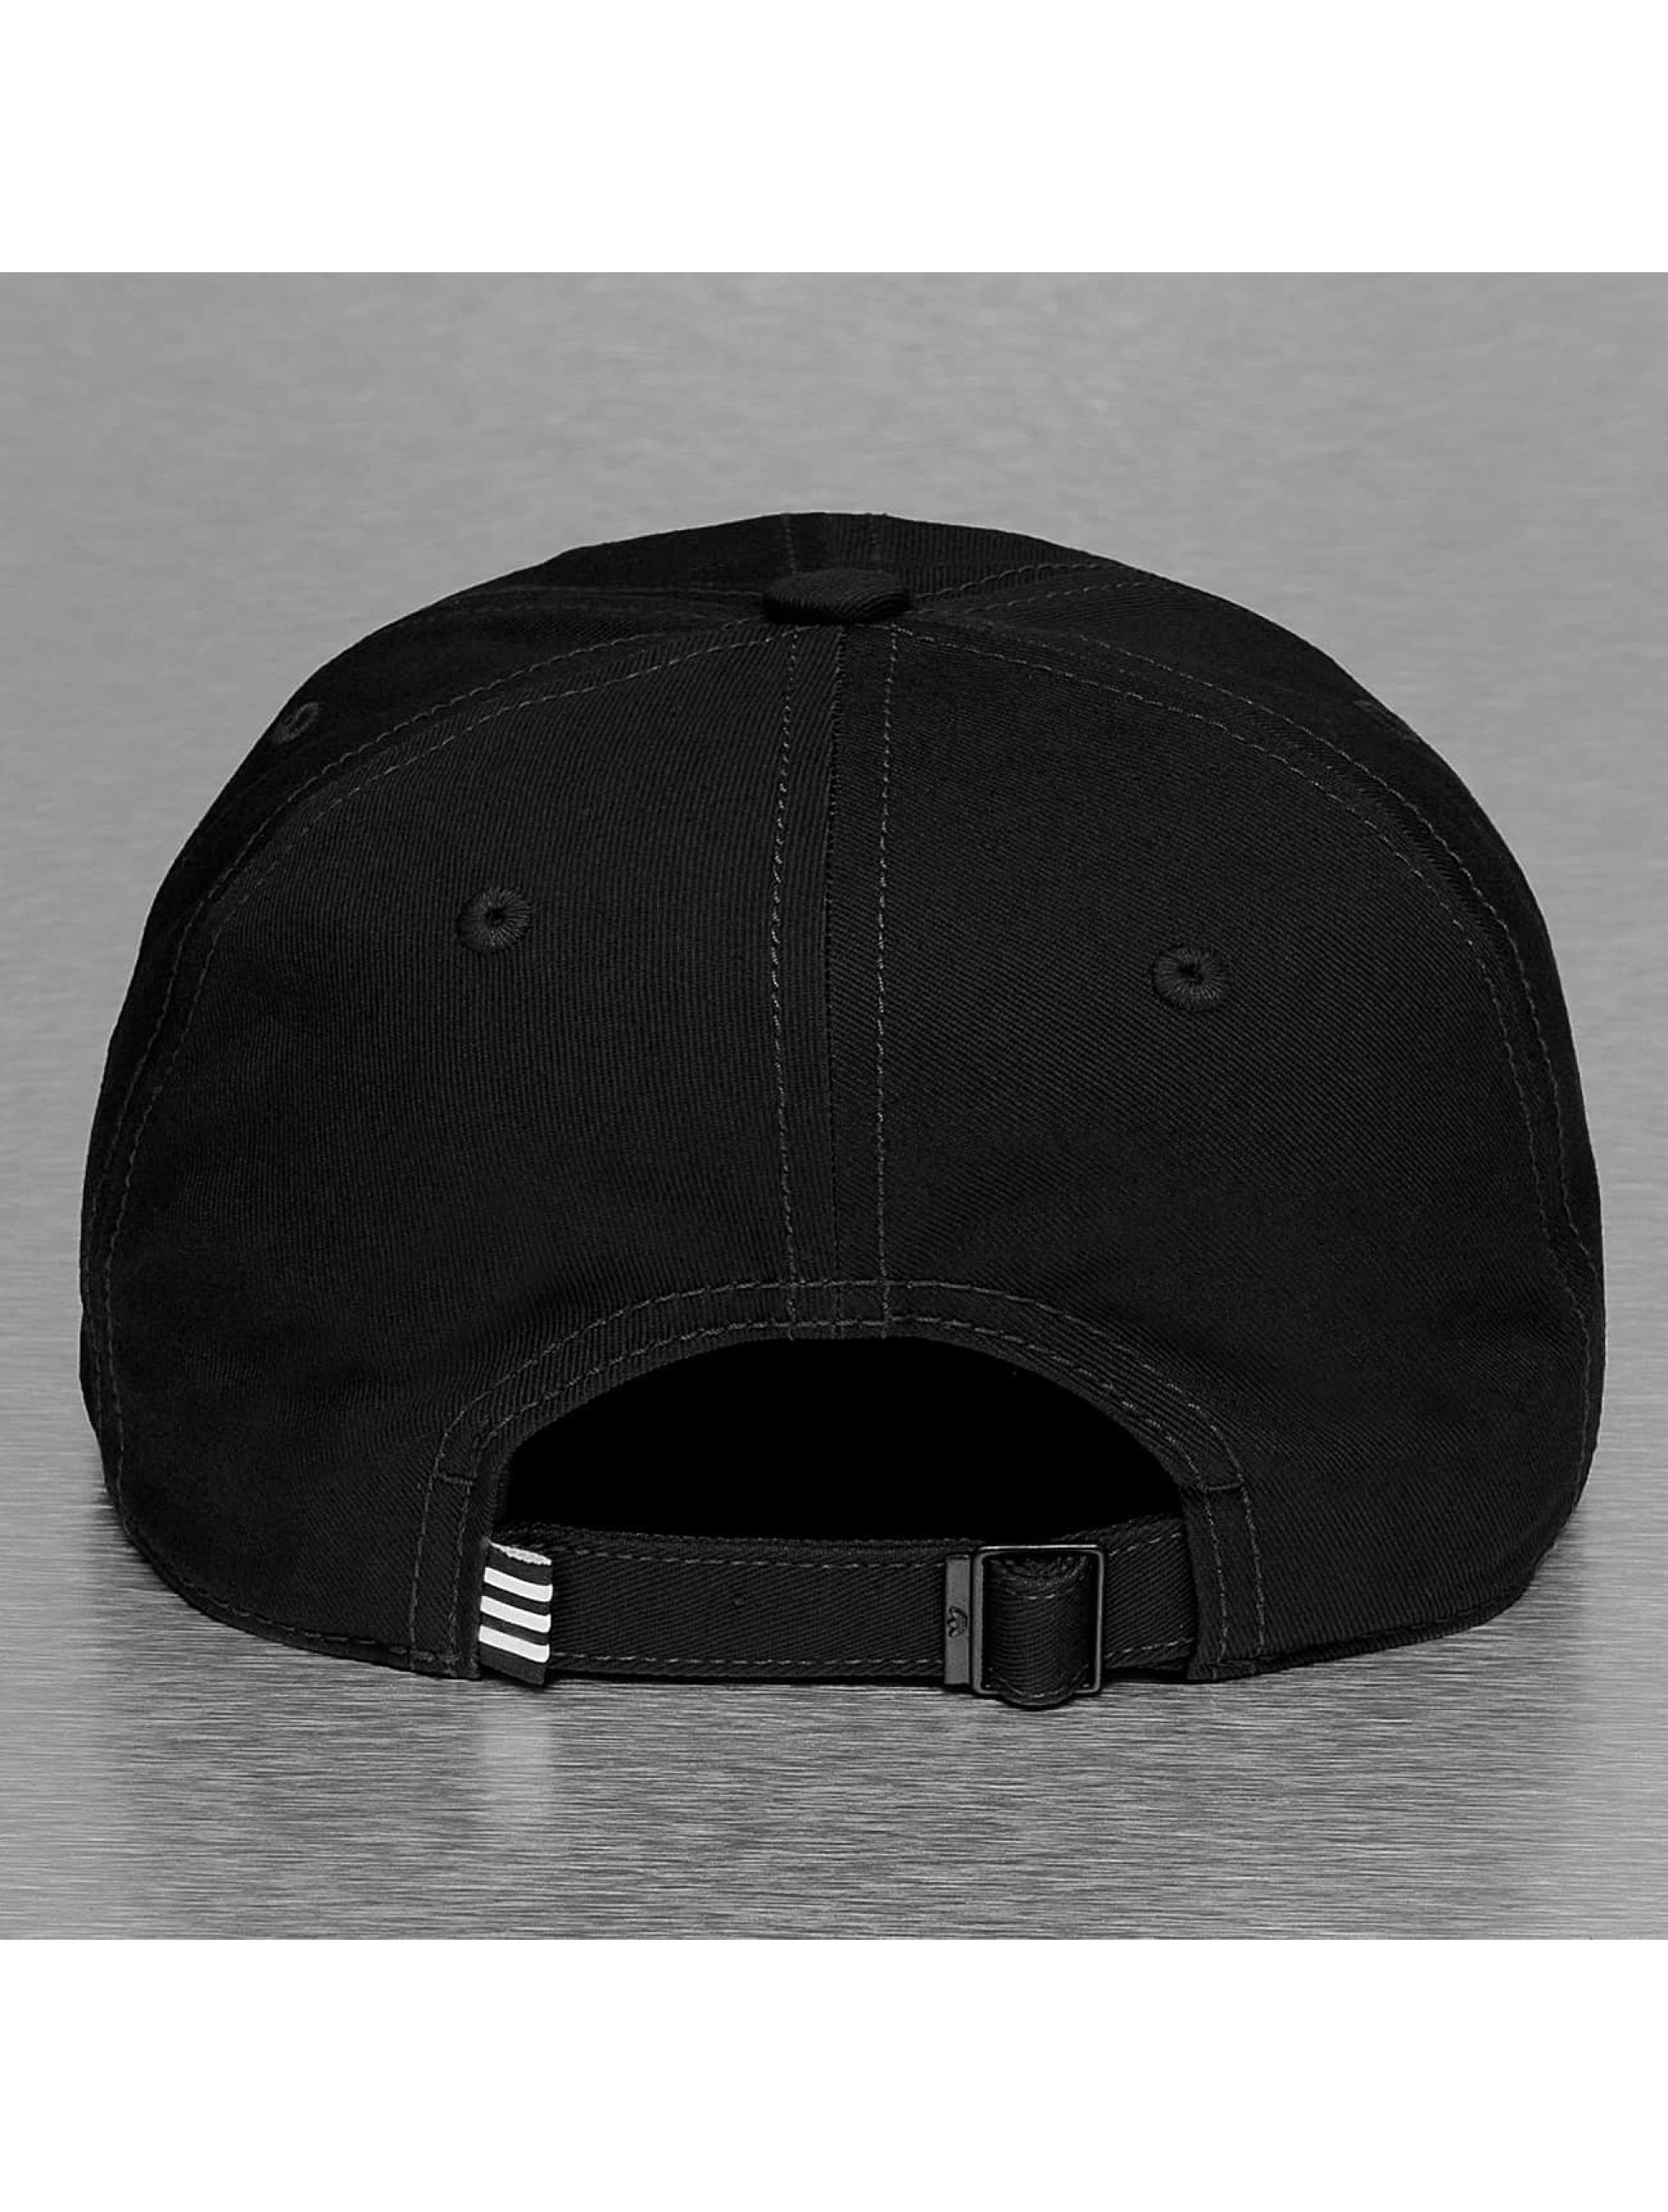 adidas herren caps flexfitted cap trefoil ebay. Black Bedroom Furniture Sets. Home Design Ideas